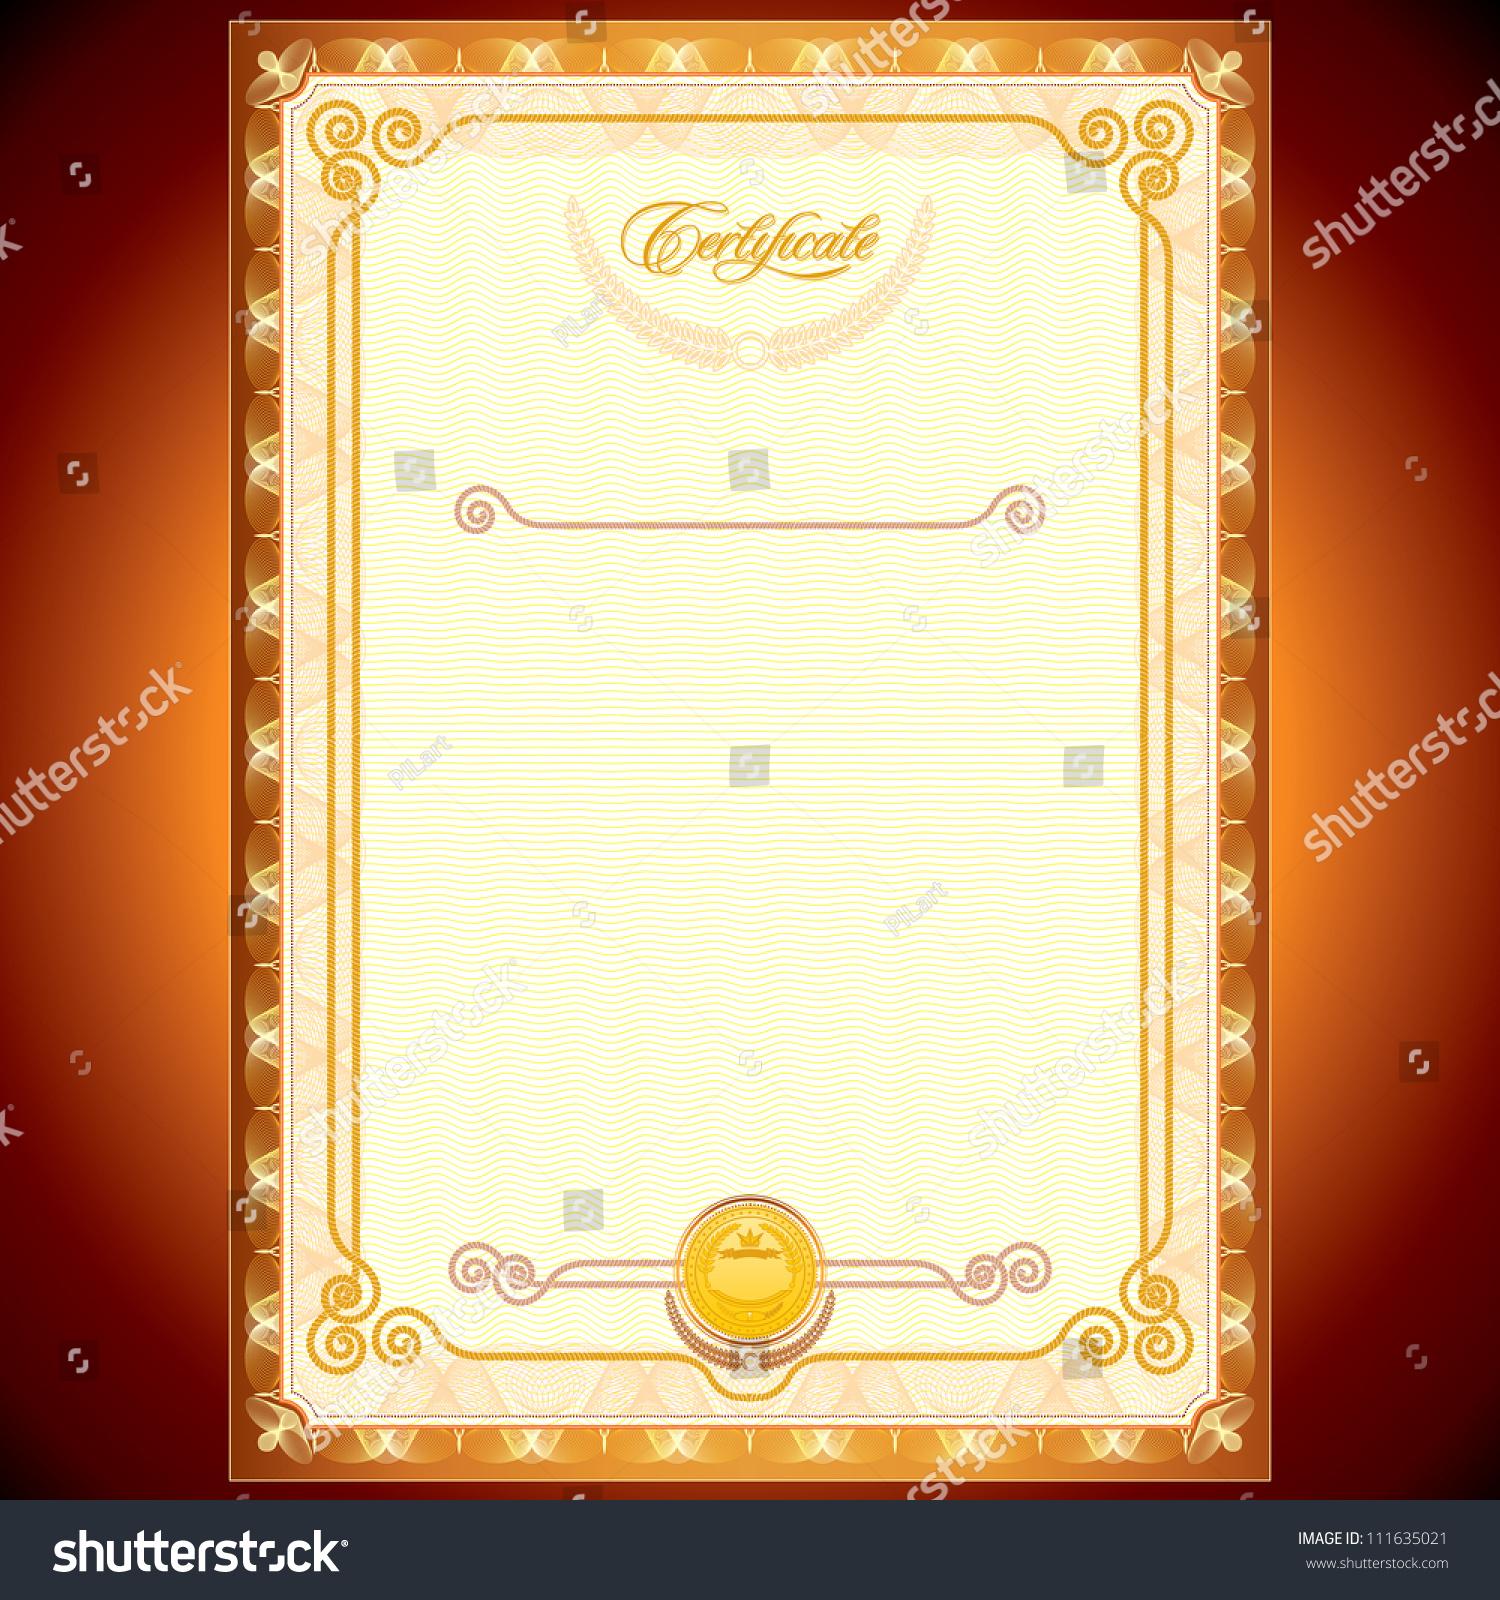 blank golden certificate  template or your design stock vector illustration 111635021   shutterstock